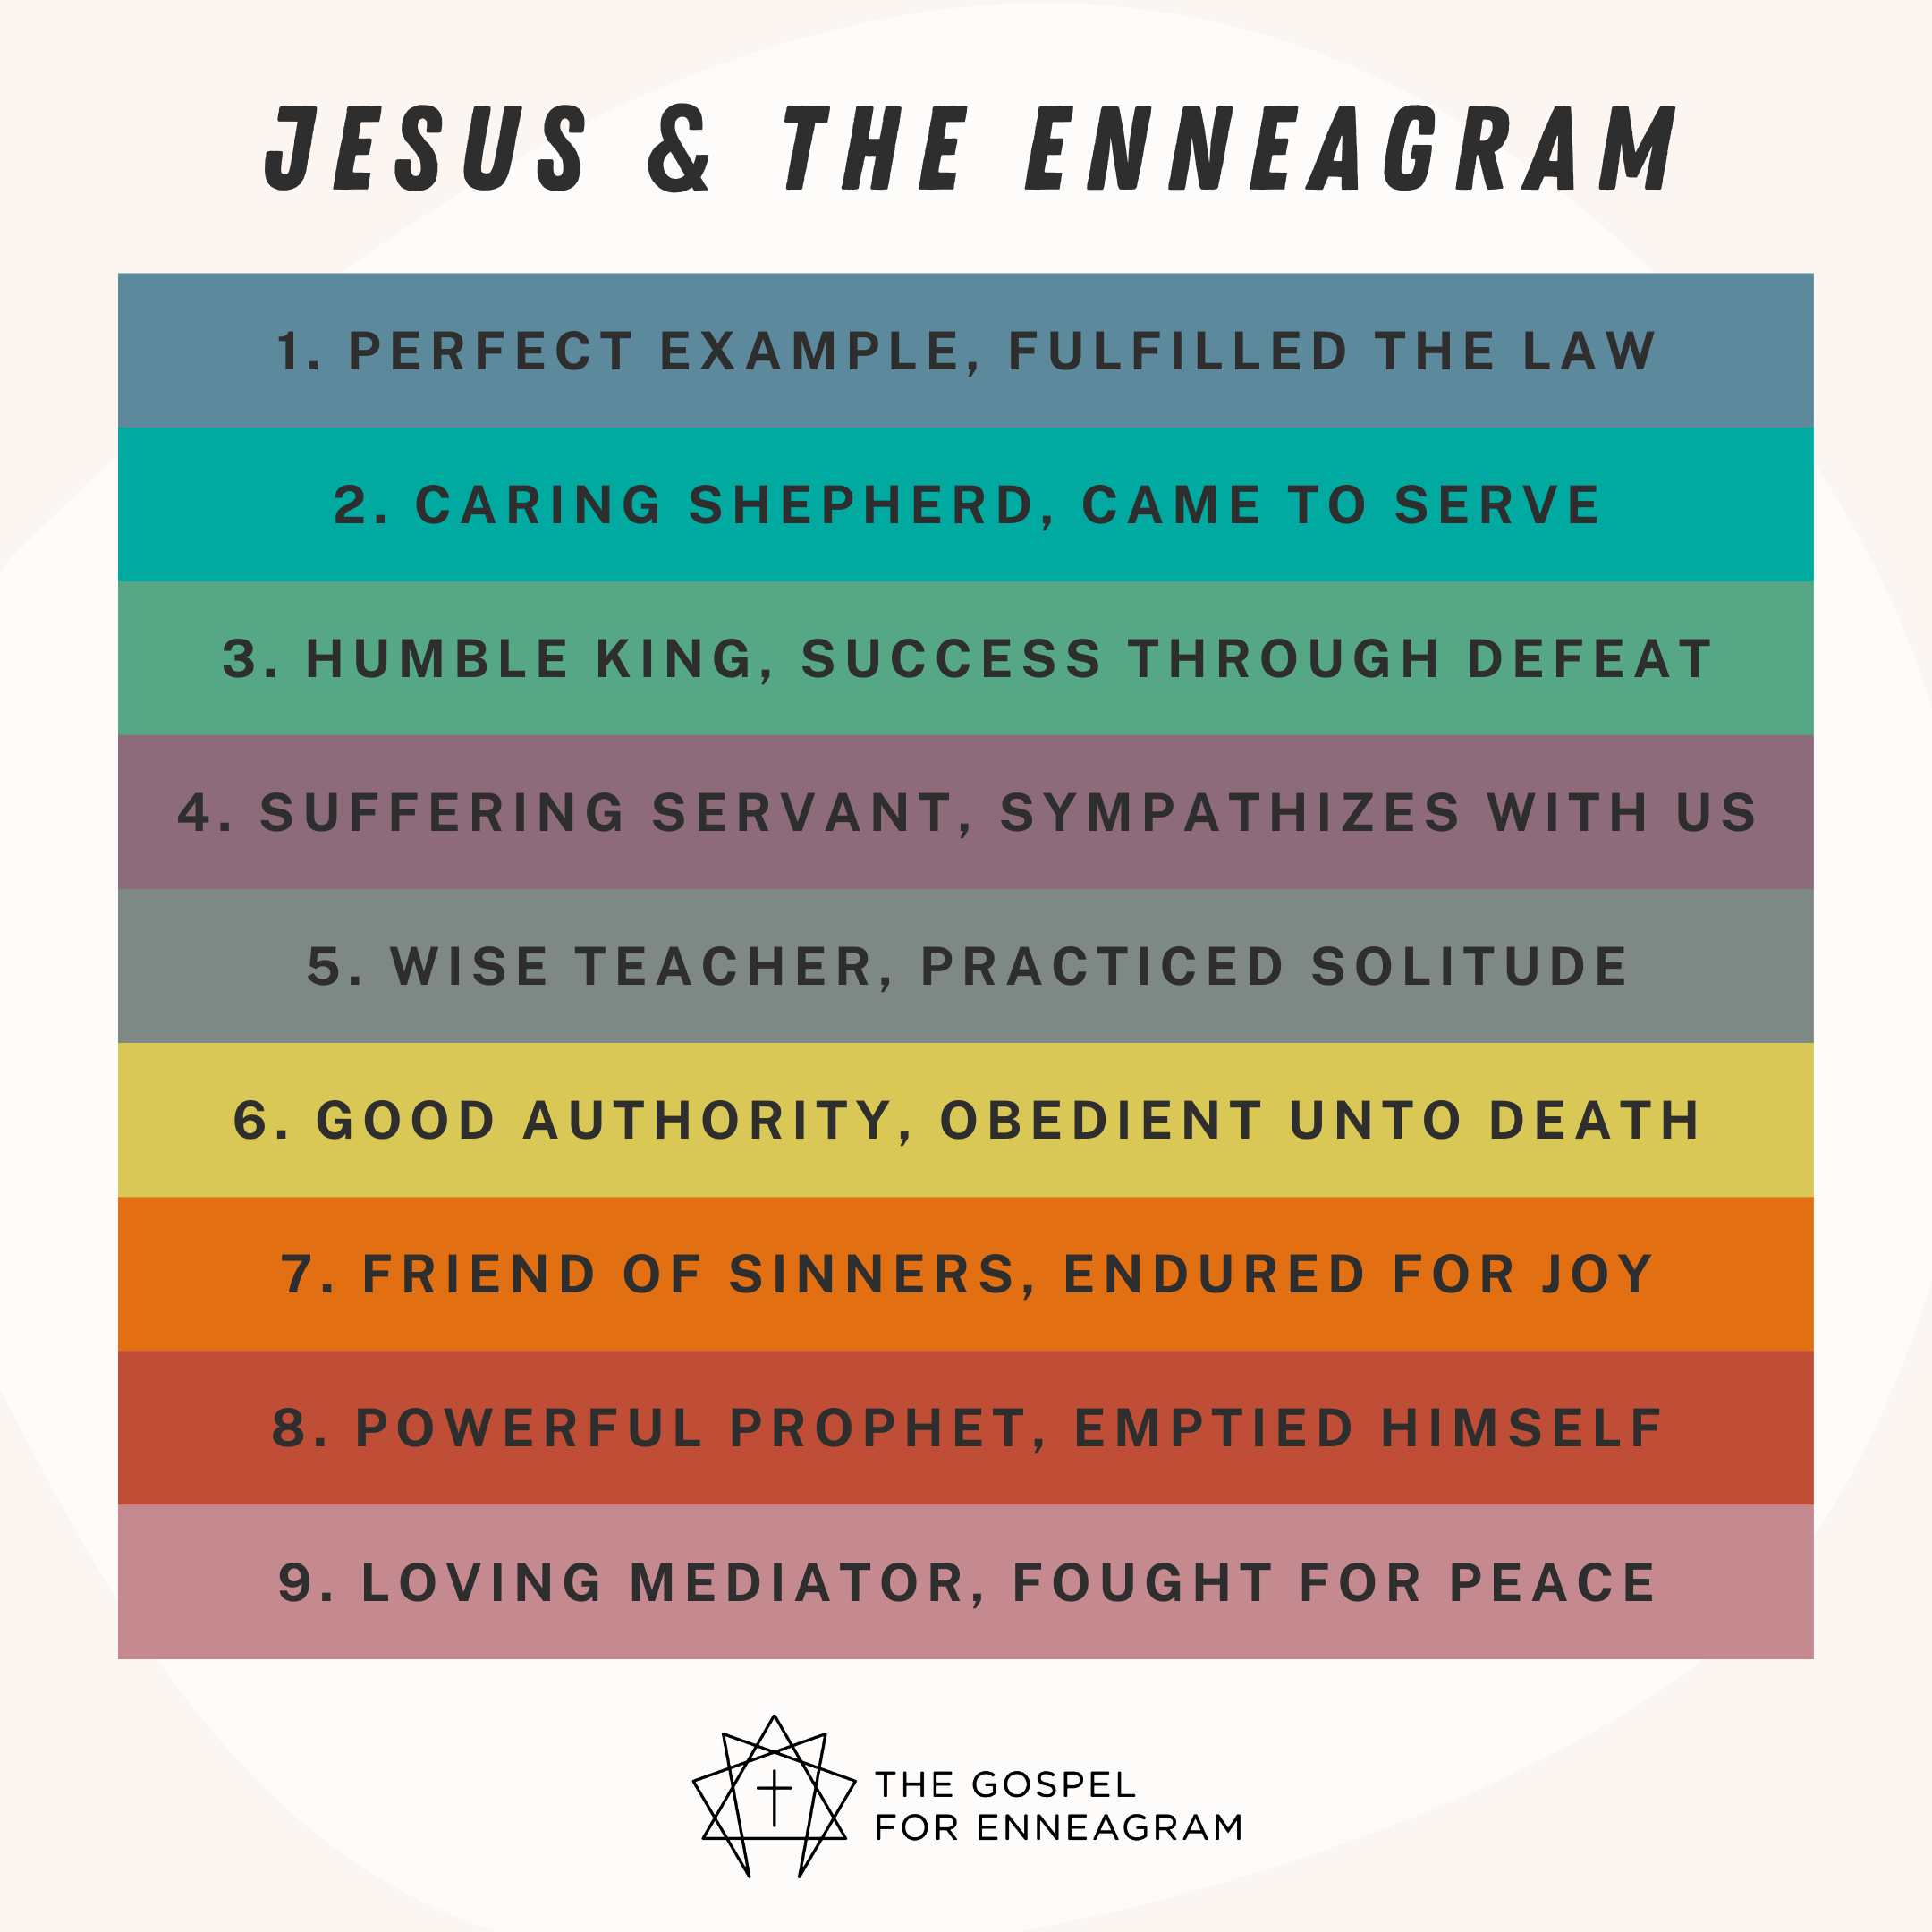 Jesus & The Enneagram